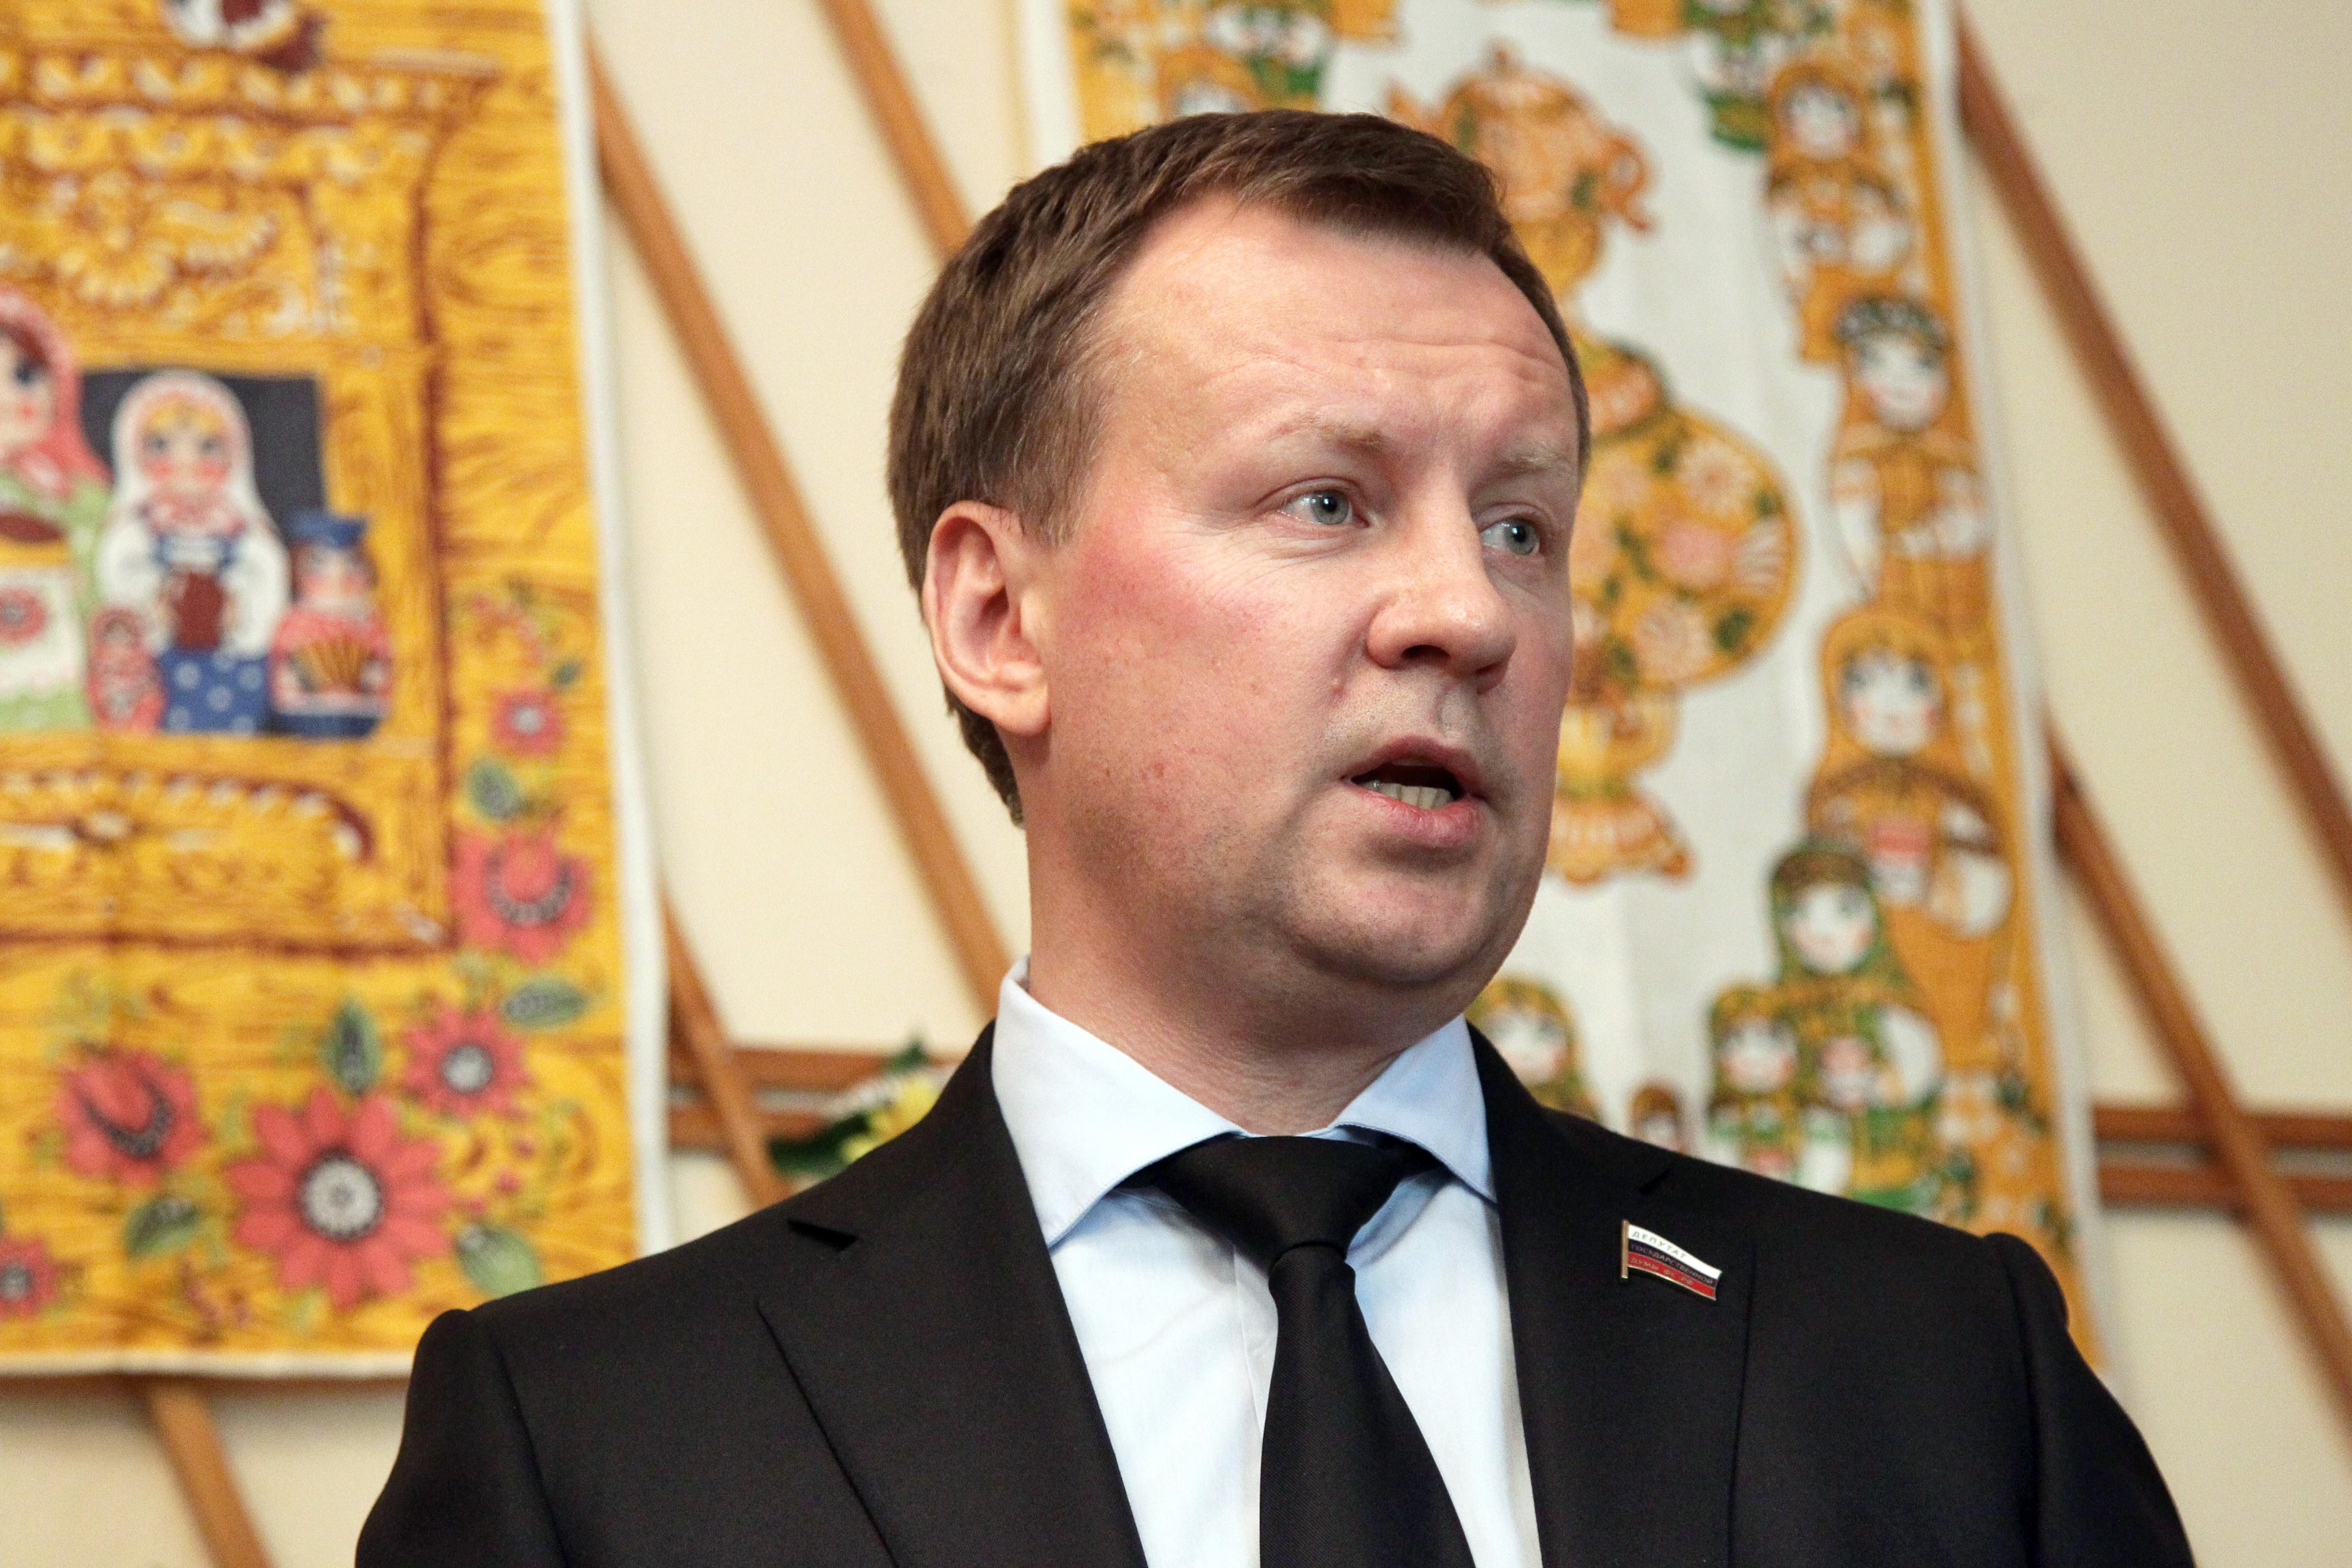 Portrait Of Denis Voronenkov, A Former Russian State Duma Member.